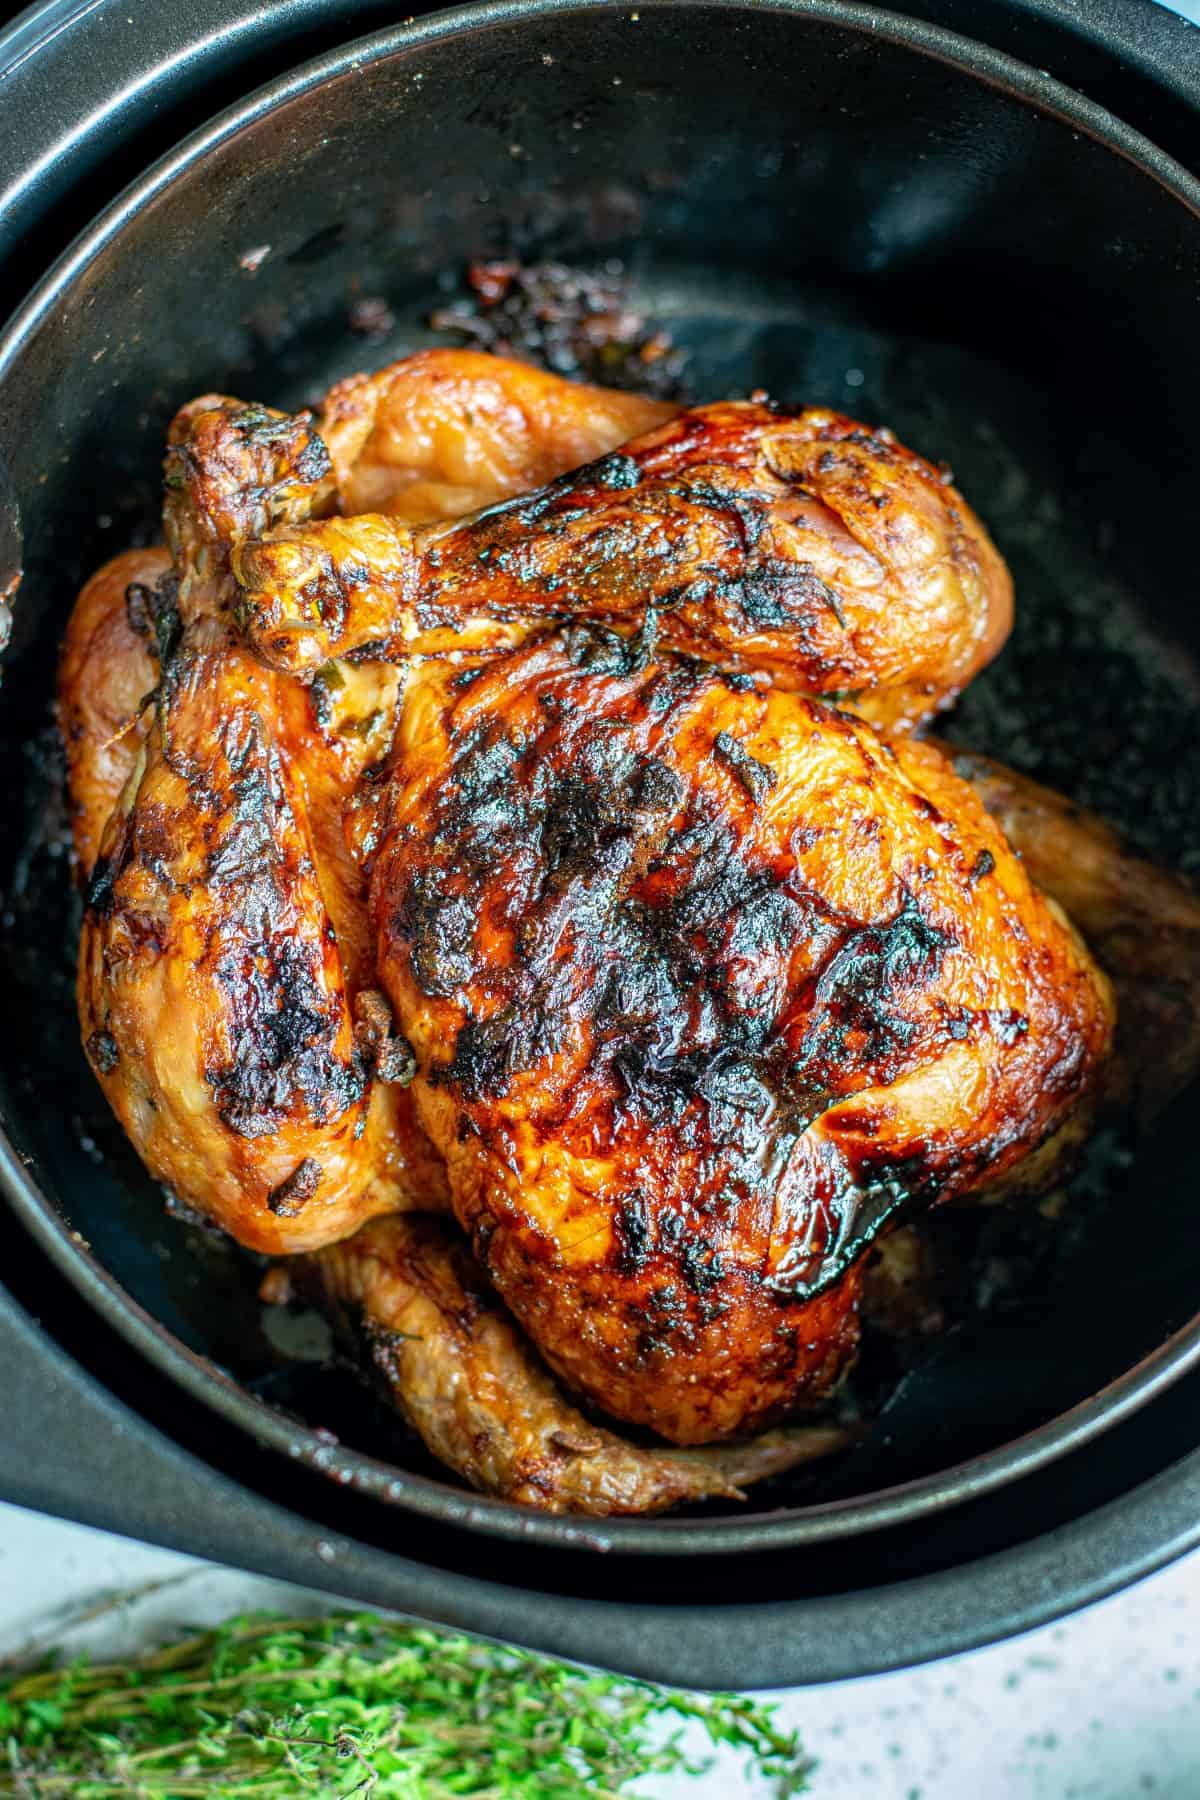 Roasted Chicken in an Air Fryer